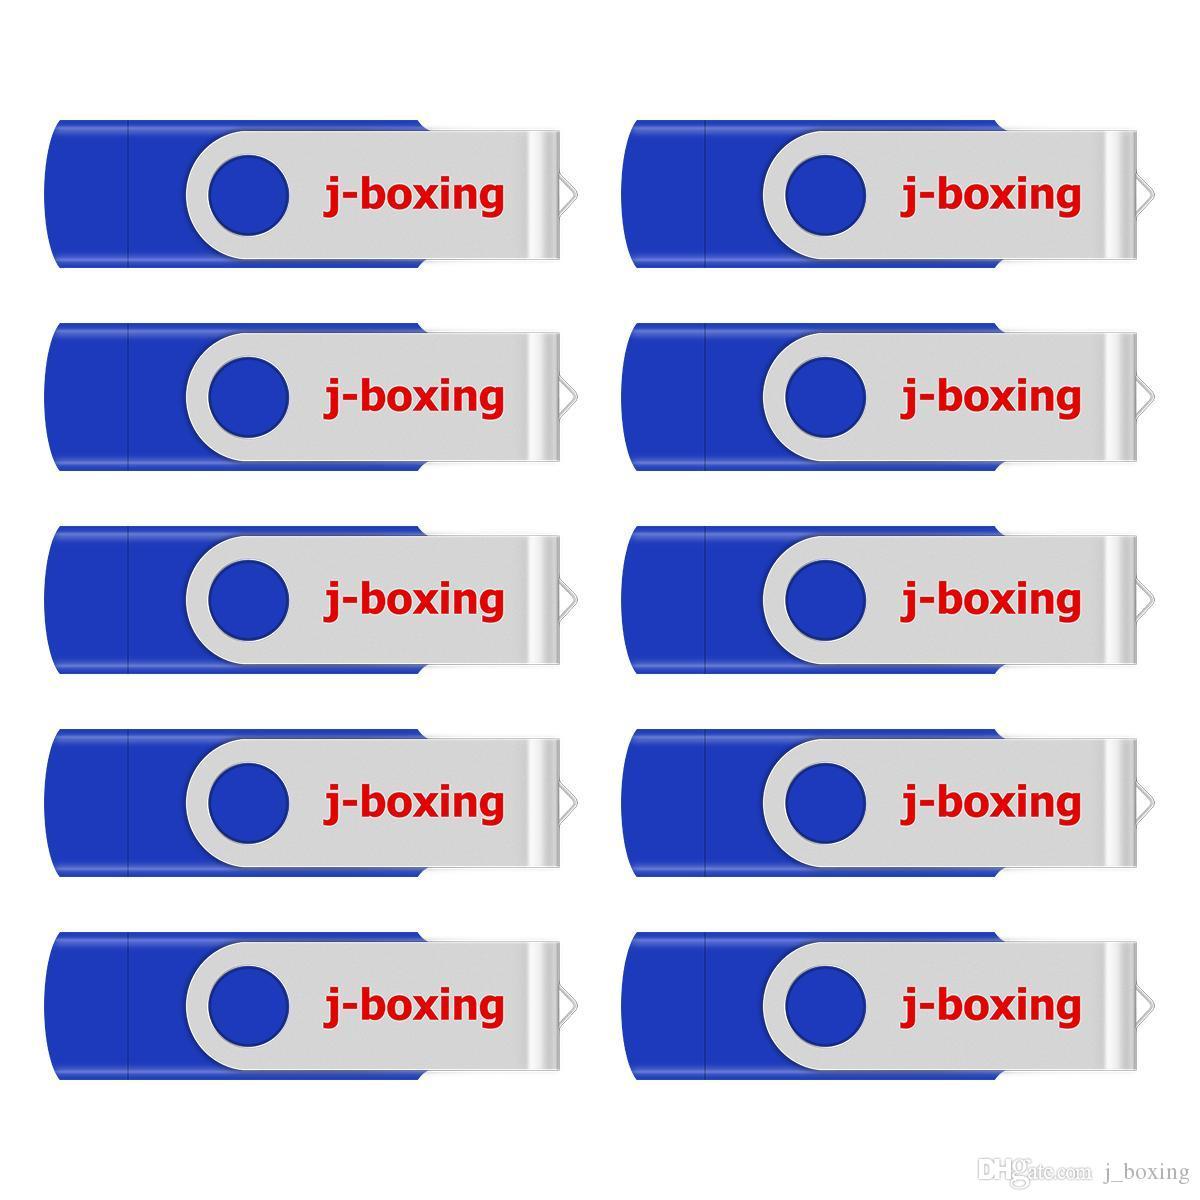 j_boxing Bleu 10PCS 8 Go OTG USB 2.0 Flash Drive clés USB Swivel Memory Stick Pen stockage pour ordinateur Smartphone Android Tablet Macbook